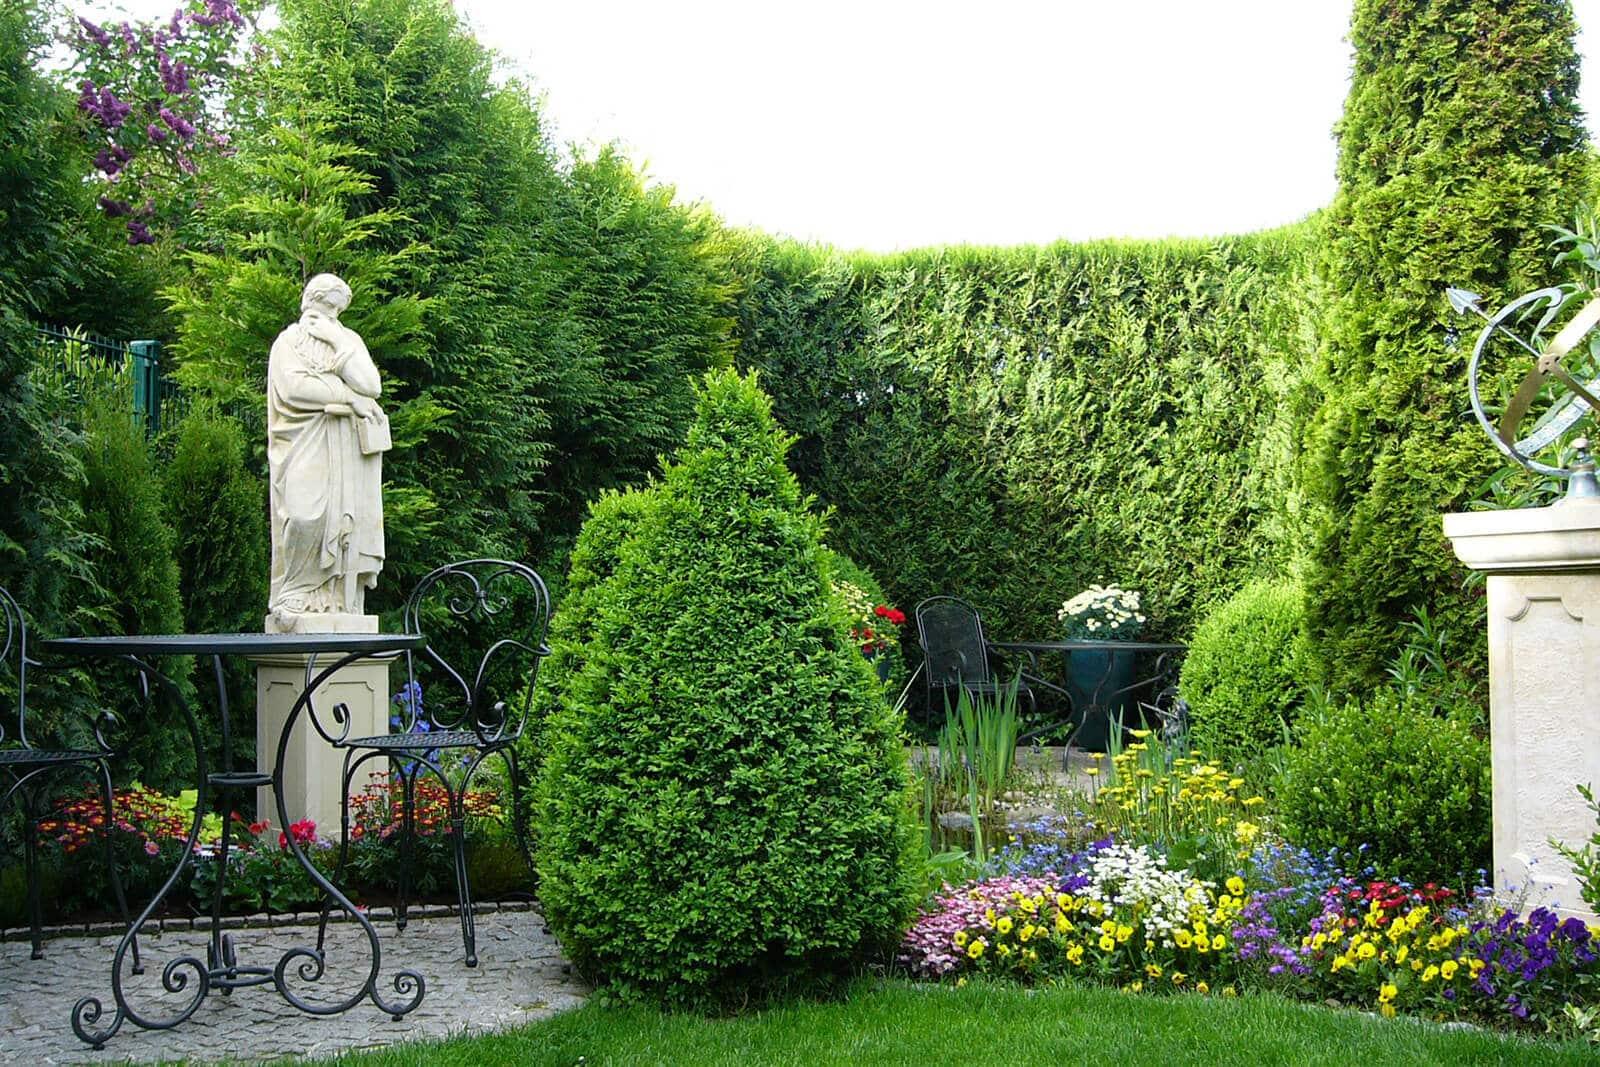 Full Size of Gartenskulpturen Stein Aus Modern Gartendeko Moderne Skulpturen Garten Skulptur Kaufen Schweiz Edelstahl Schaukelstuhl Beistelltisch Sonnensegel Fußballtor Garten Garten Skulpturen